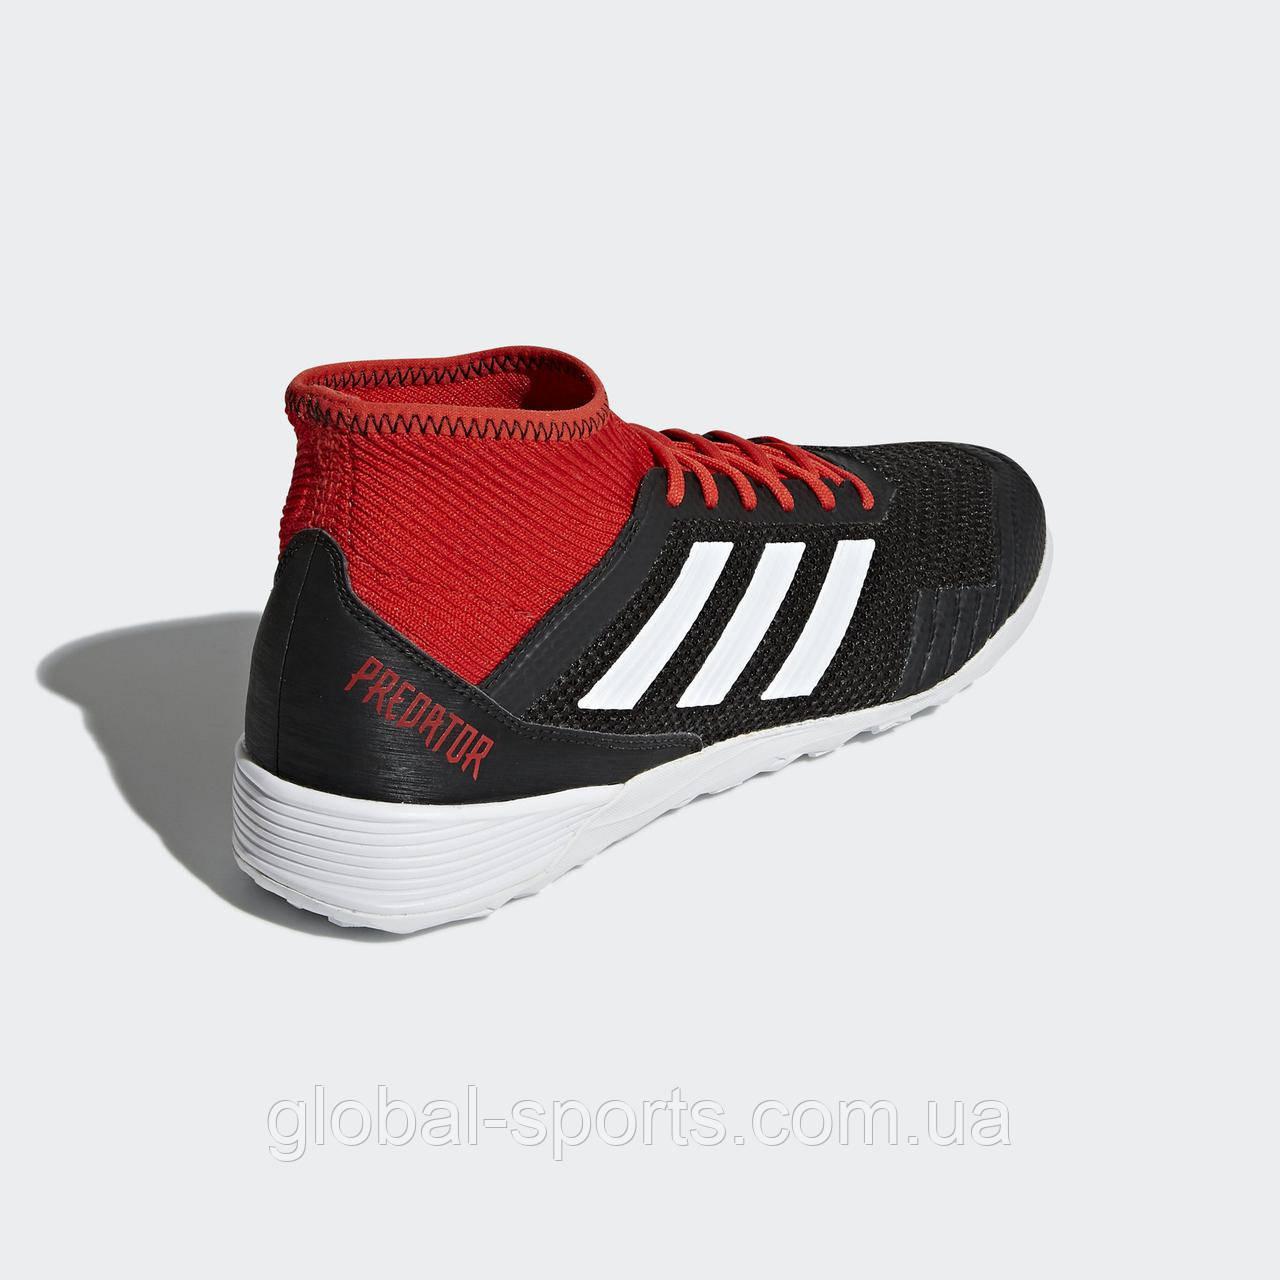 3a0b9113 ... Футбольные бутсы (футзалки) Adidas Predator Tango 18.3 IN(Артикул:DB2128),  ...